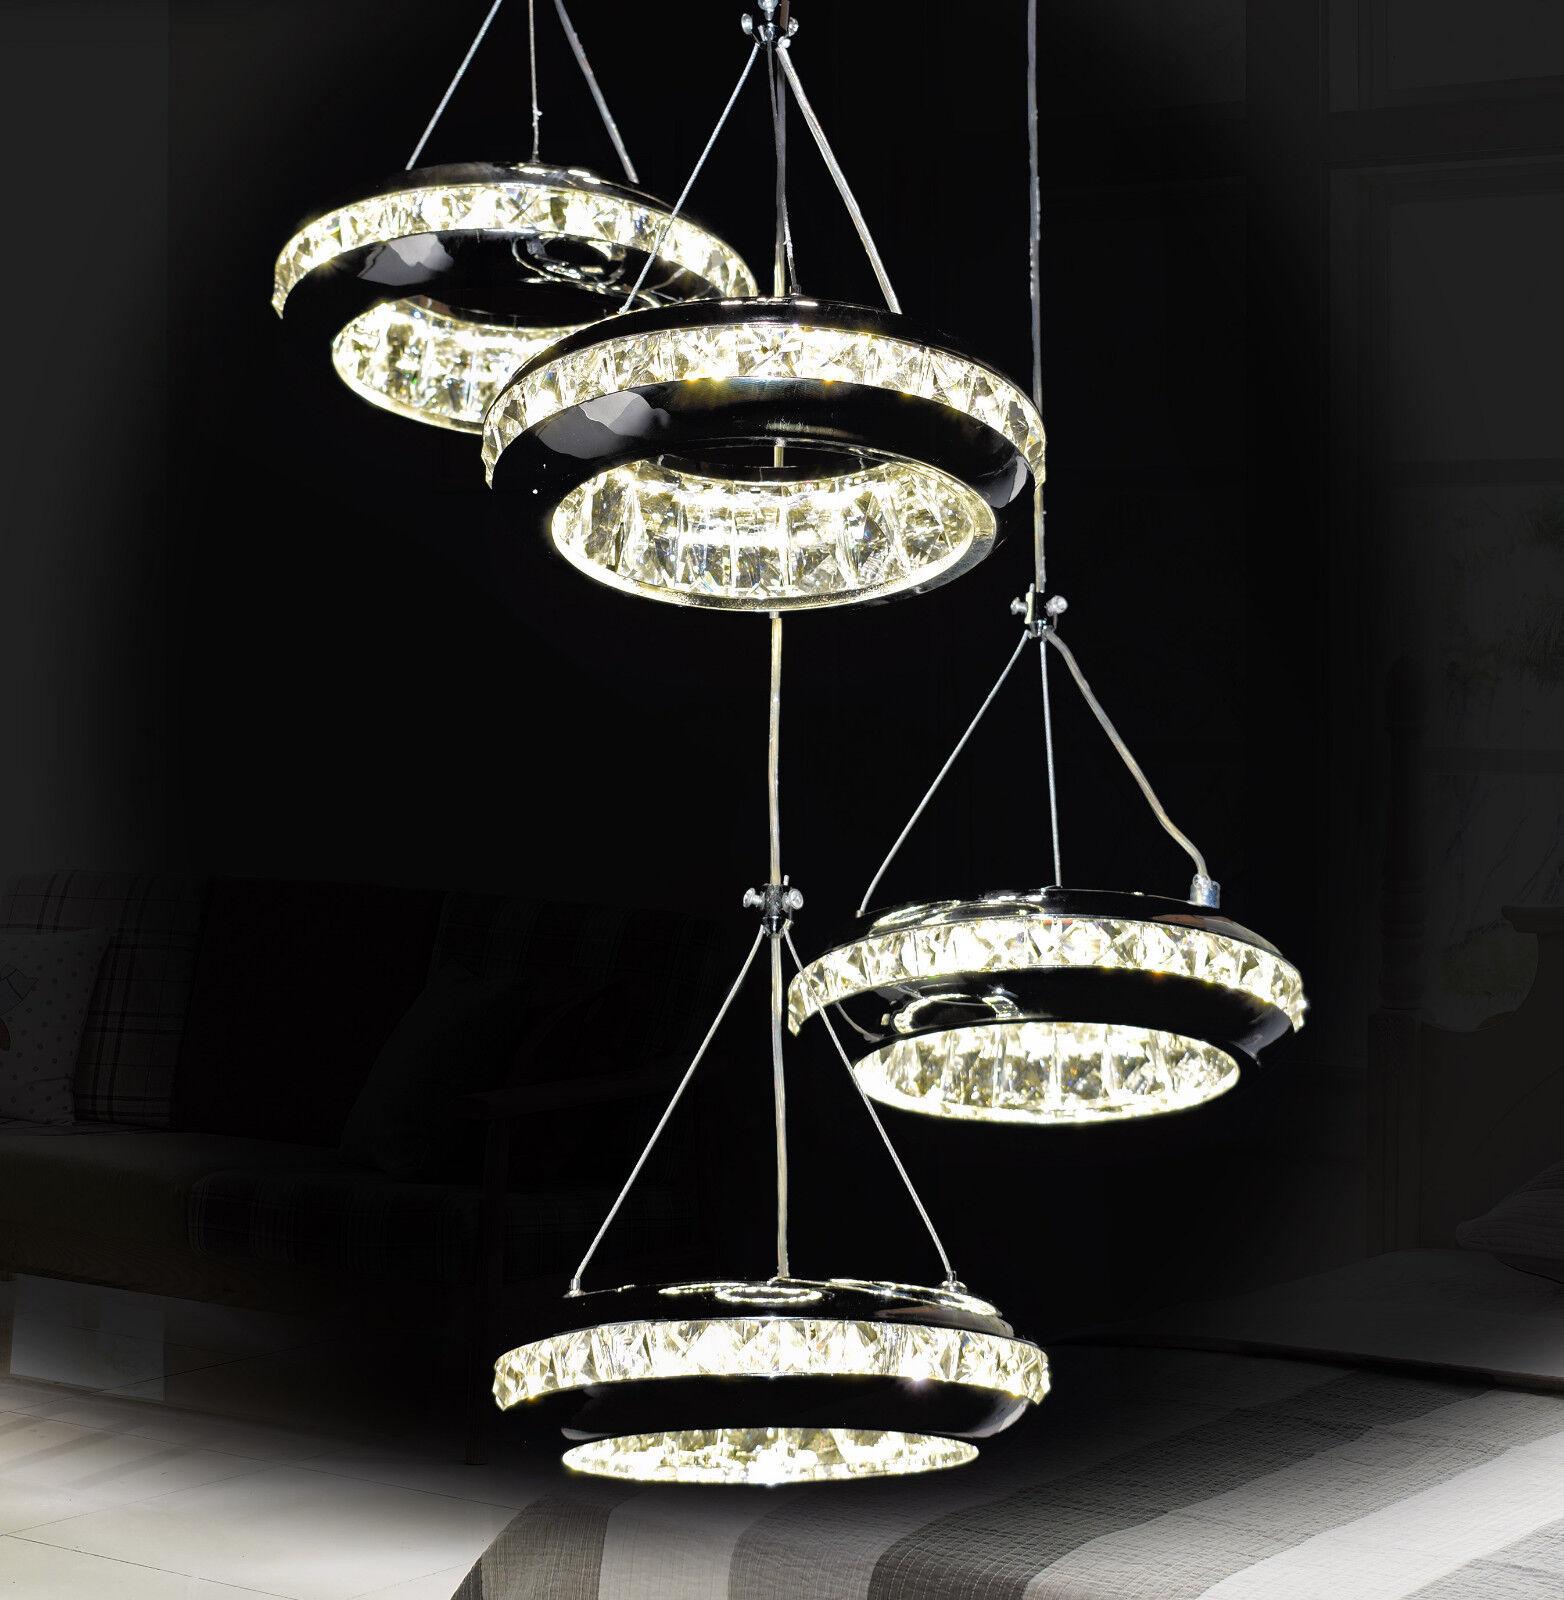 DEL DEL DEL Lustre Plafonnier Lampe Verre Cristal Froid Chaud Lumière de Lustres Plafond | Service Supremacy  eaae77